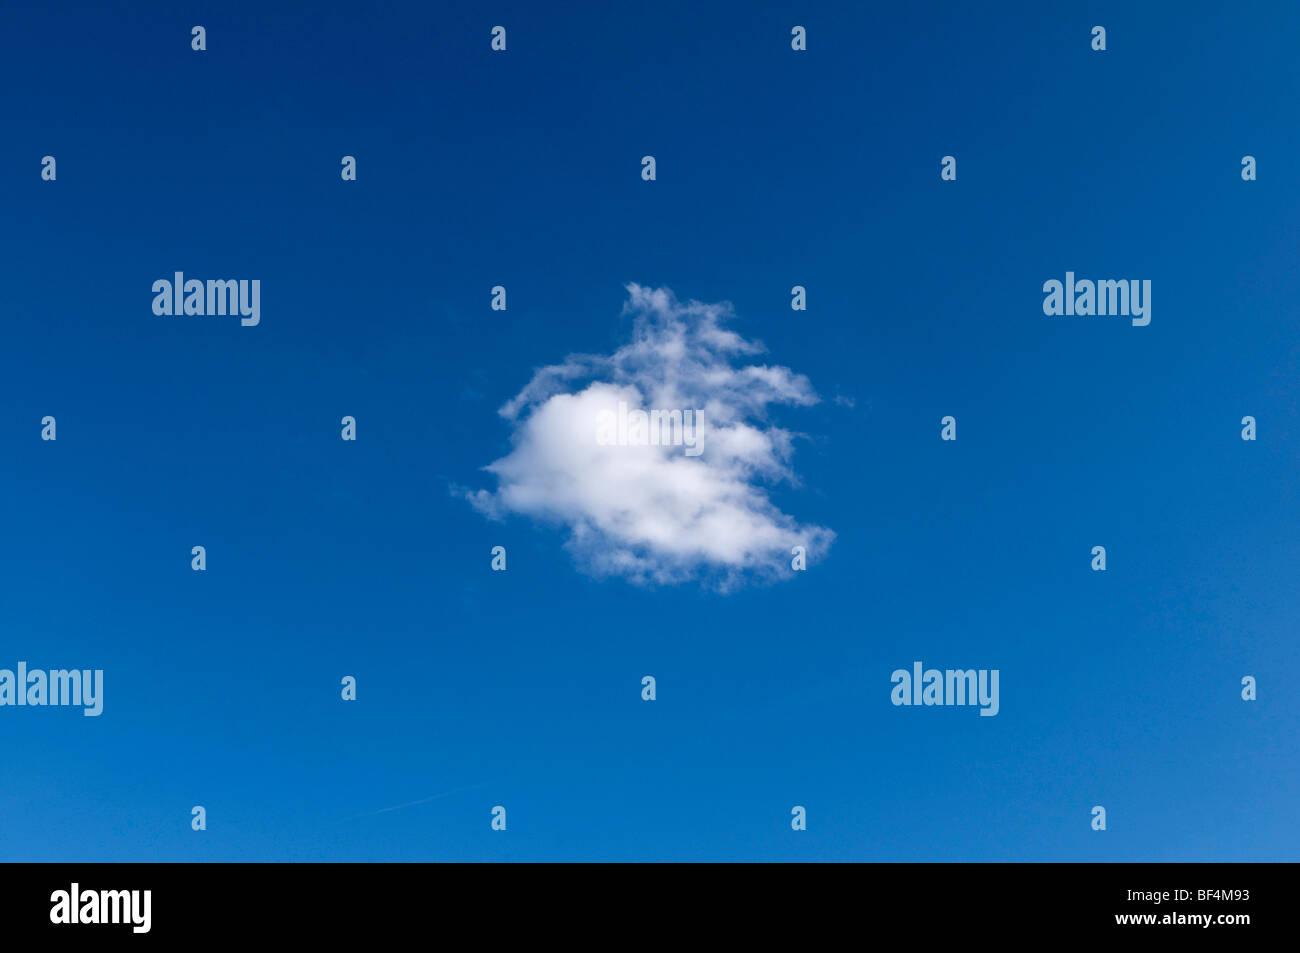 Small cumulus cloud in a blue sky - Stock Image